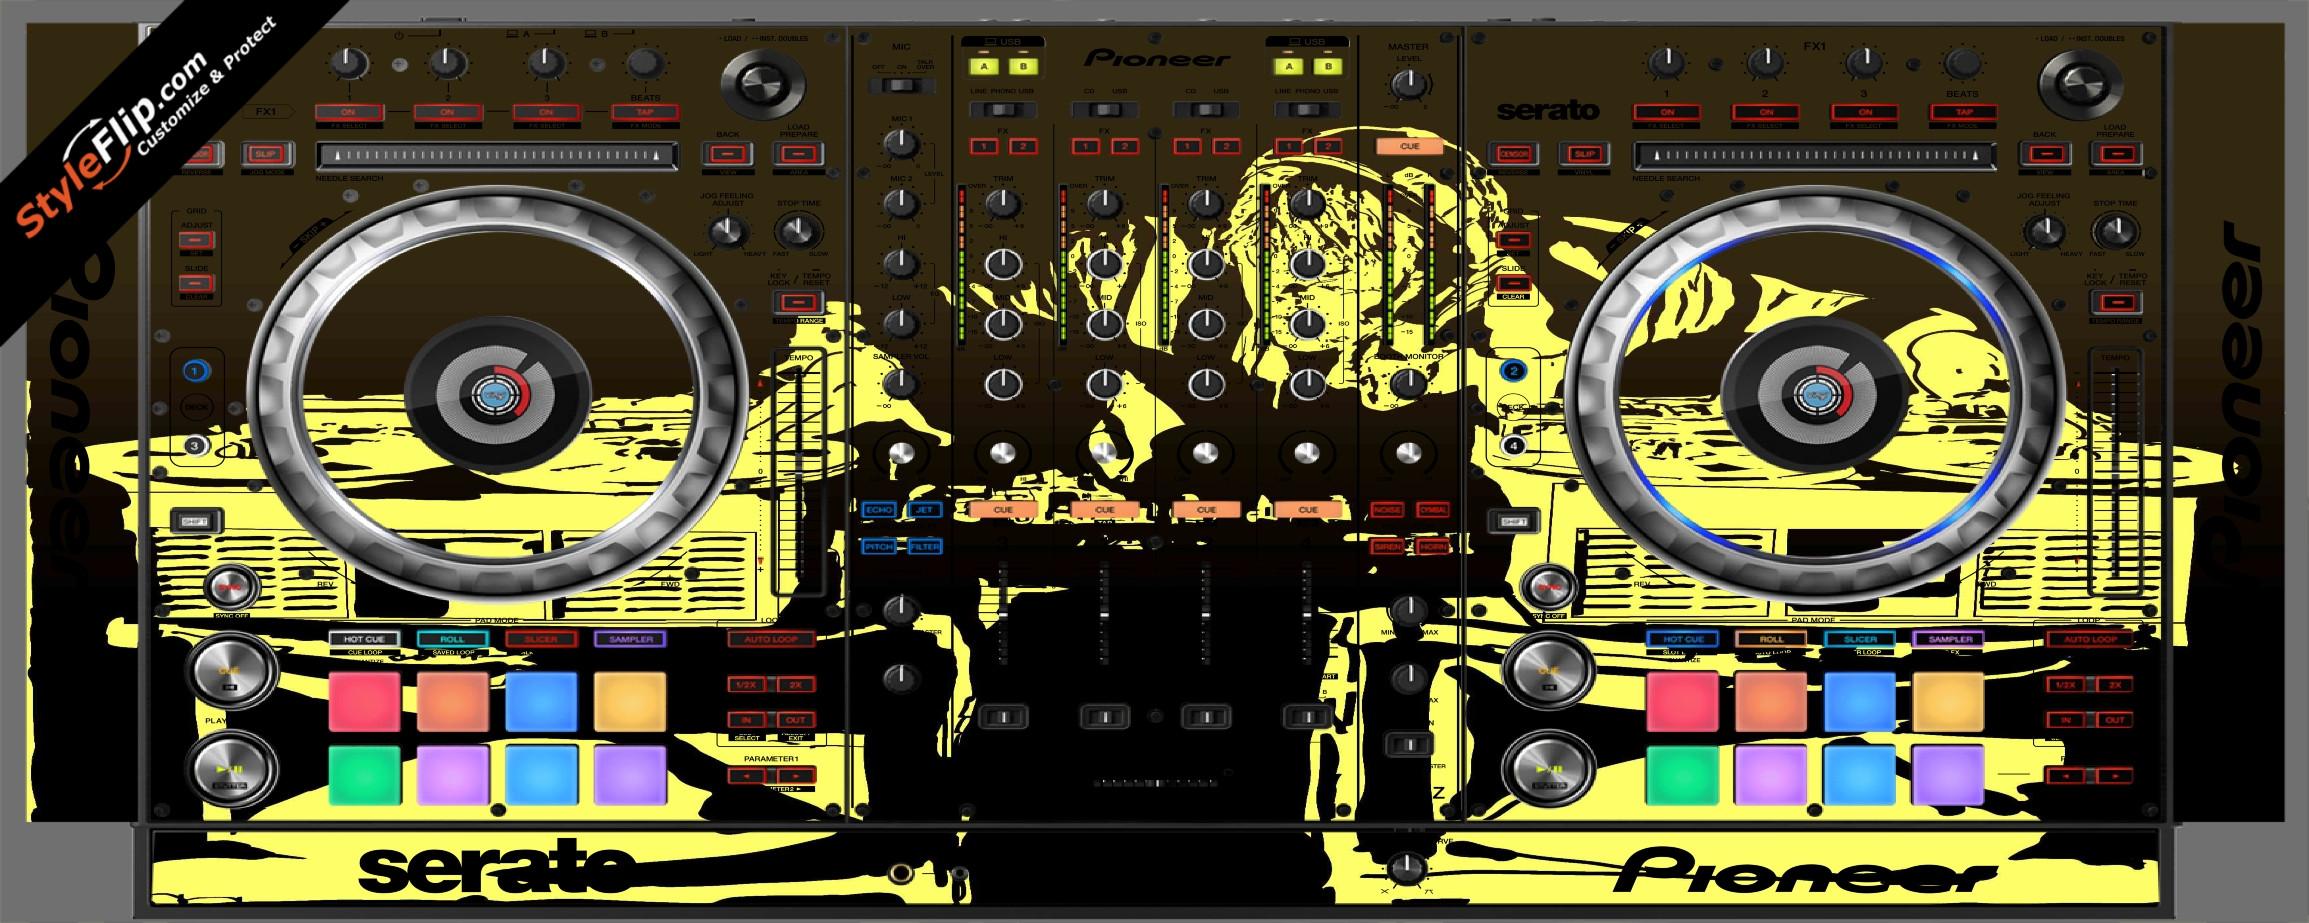 Scratch Master Pioneer DDJ-SZ